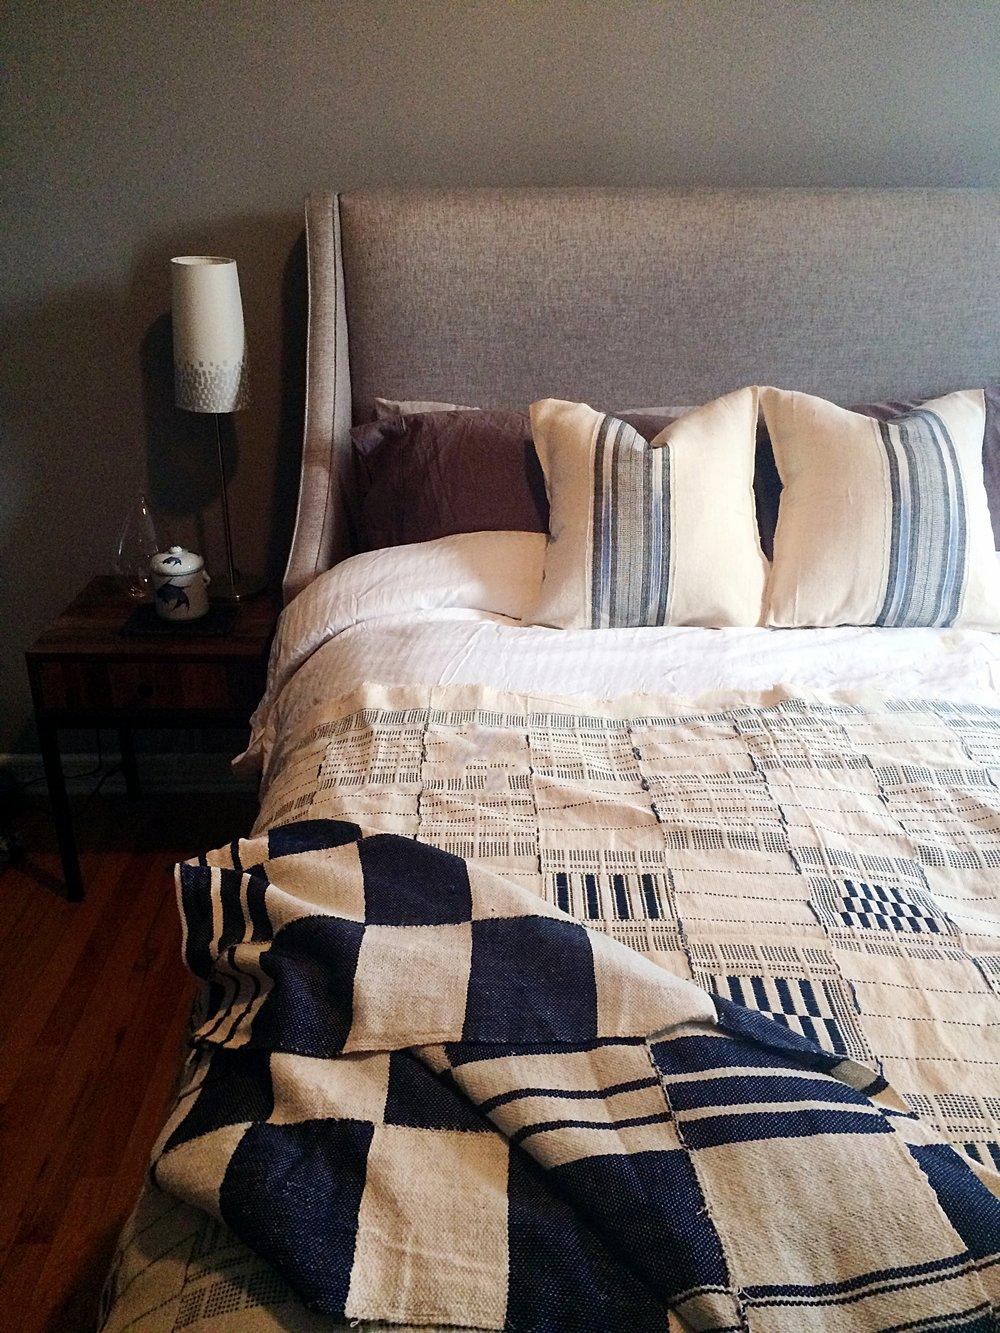 Sirakogoman Pillows and Artisanal Bedspread